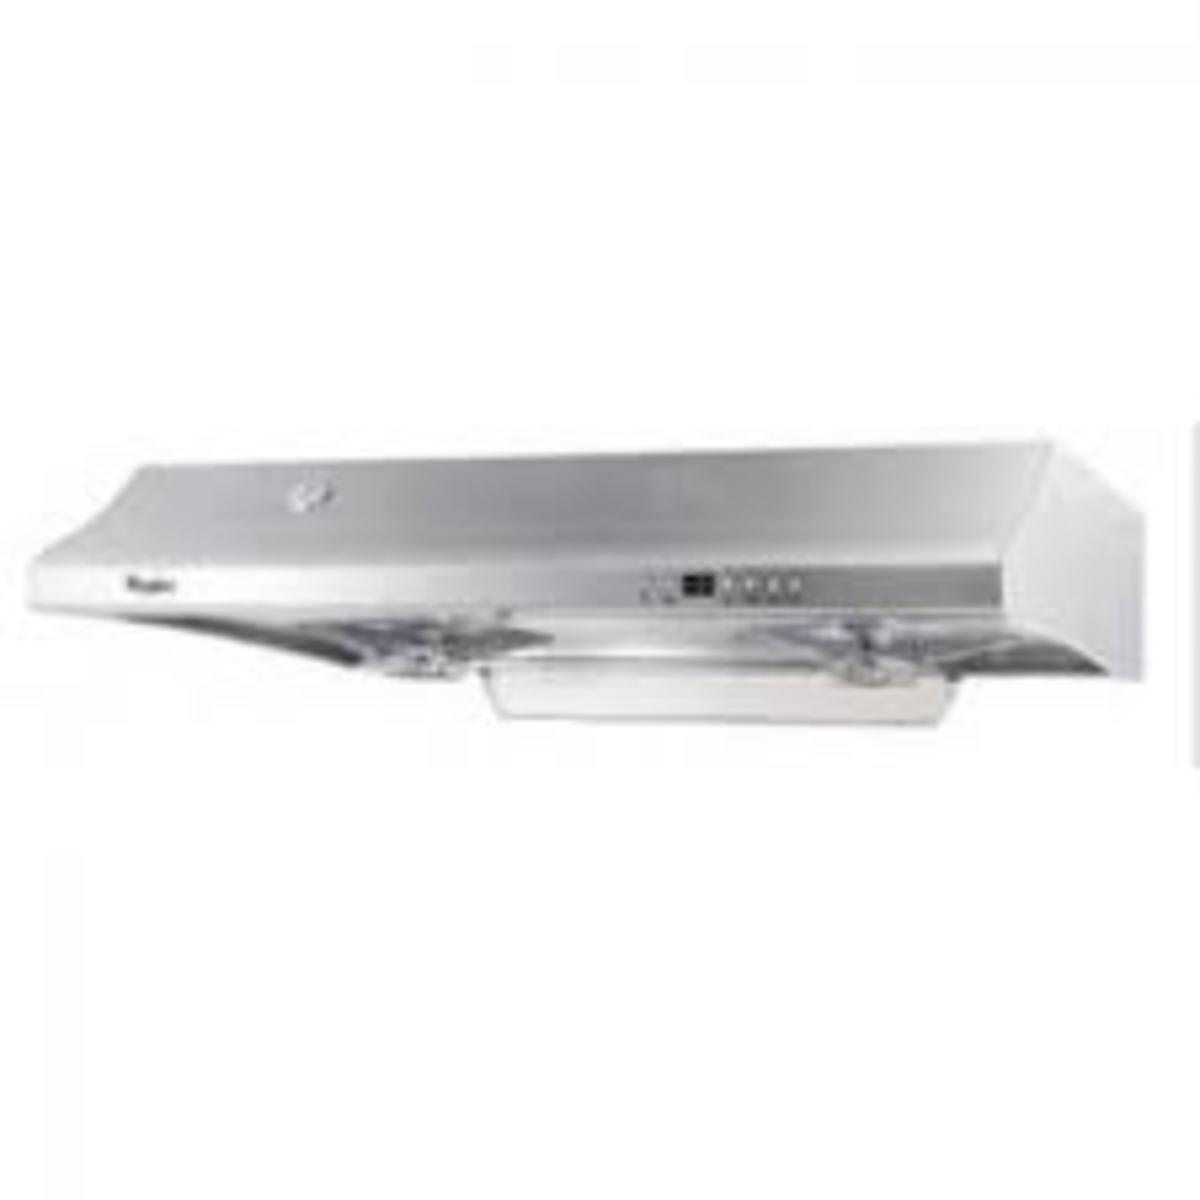 HC768S 71cm 2in1 Detachable & Auto-washed Cookerhood  (1-year Whirlpool Warranty)